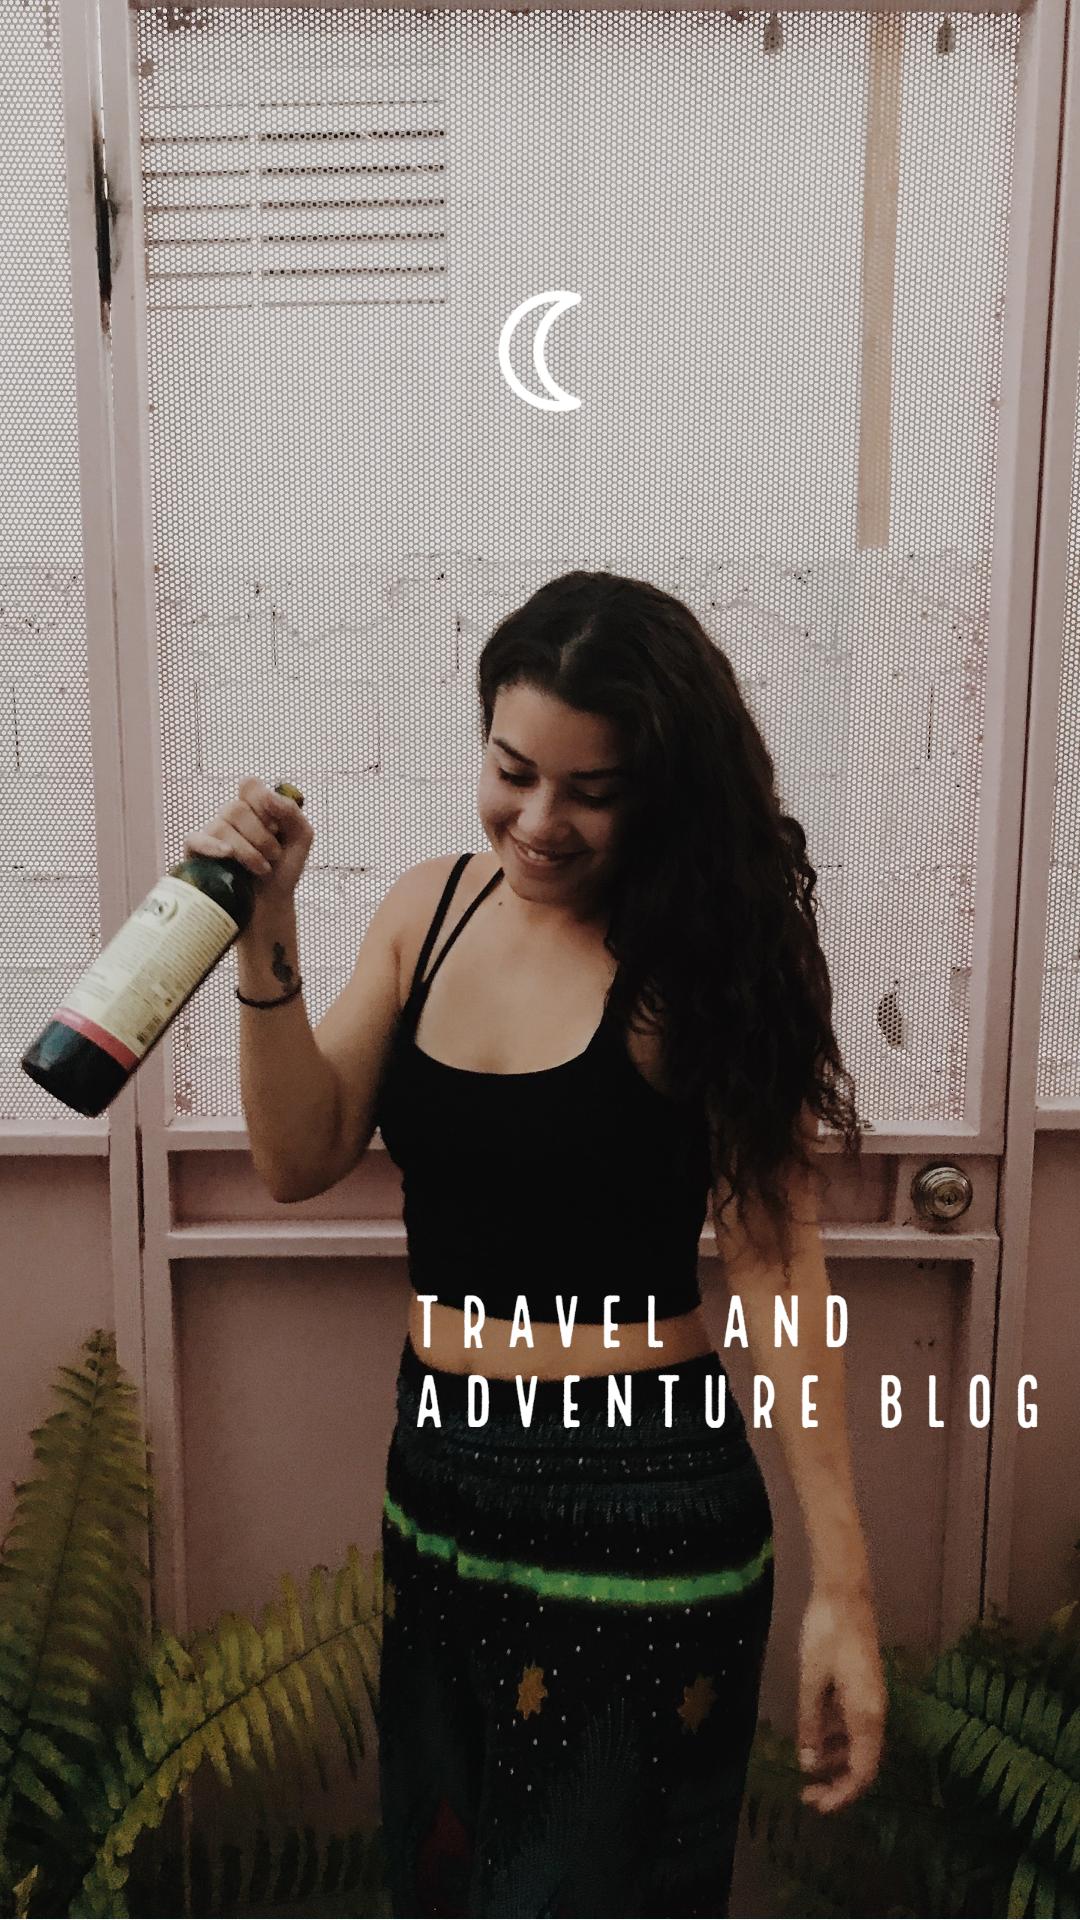 ashley gabrielle travel and adventure blog